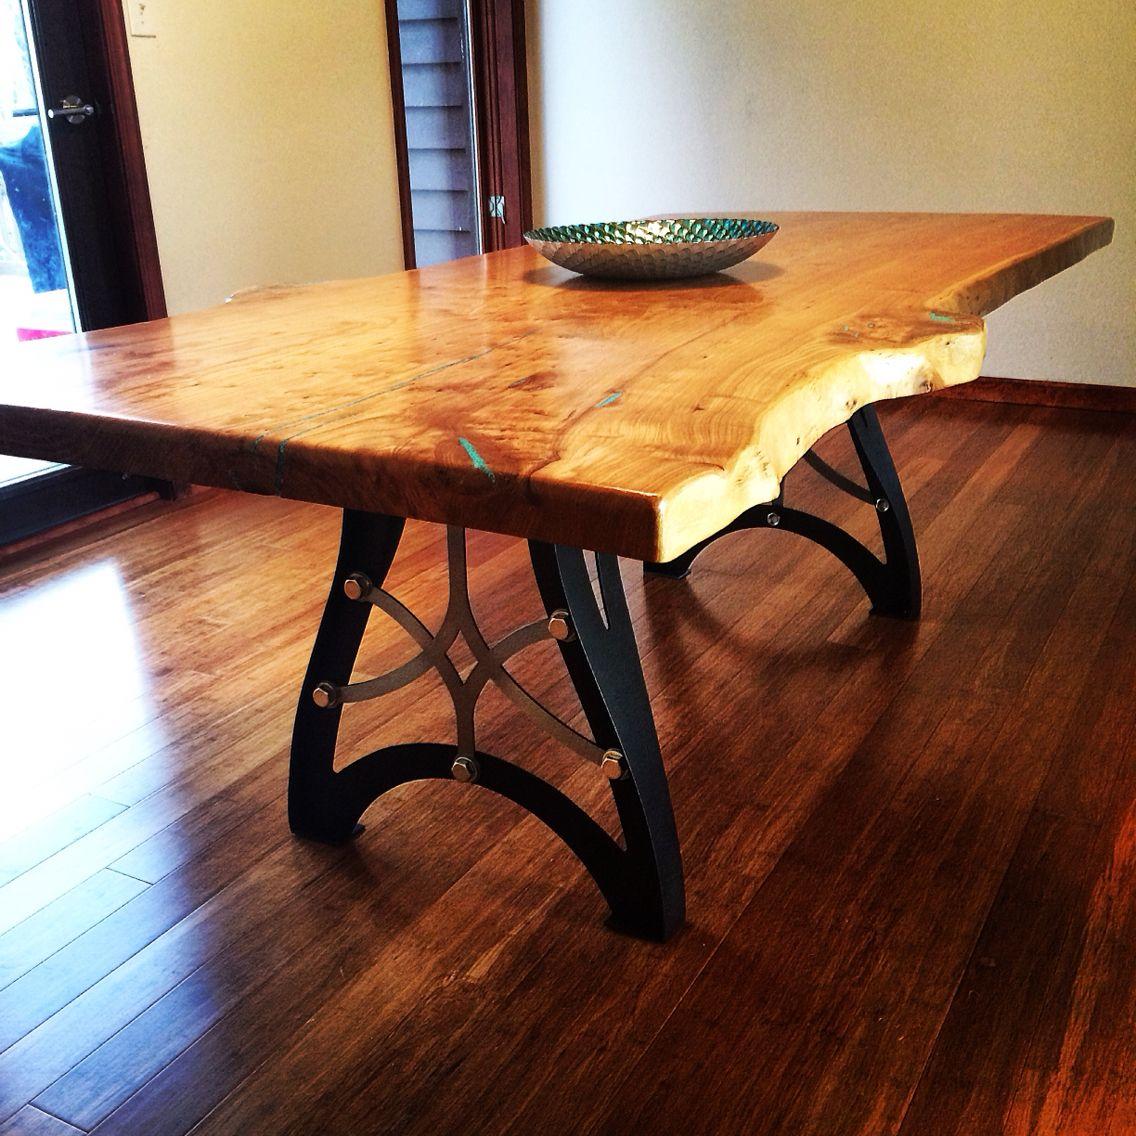 Vintage Handmade Slab Wood Coffee Table From: Handcrafted Vintage Industrial Steampunk Metal Legs, Live